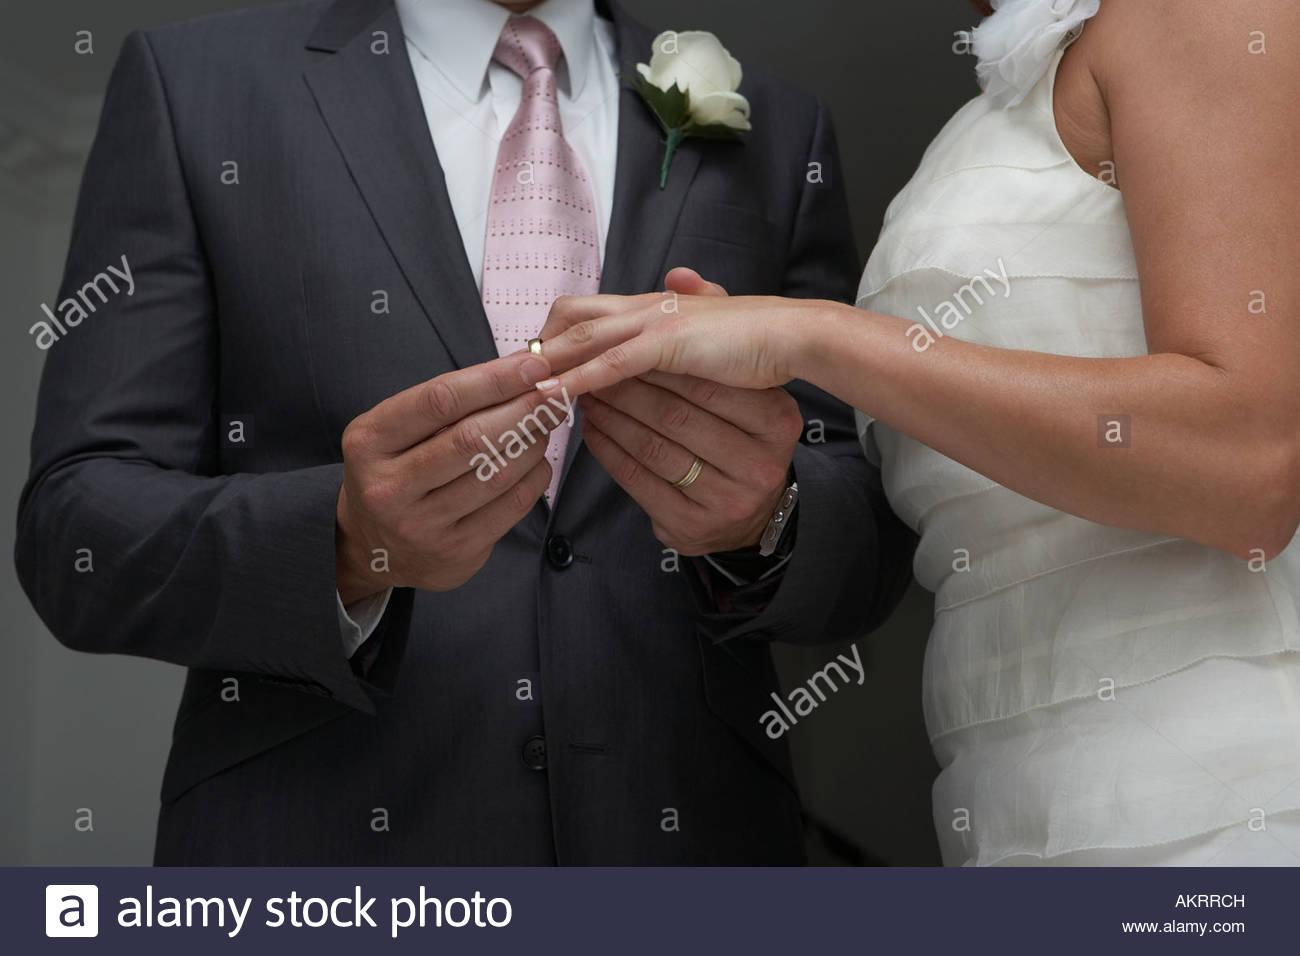 Groom putting ring on brides finger - Stock Image